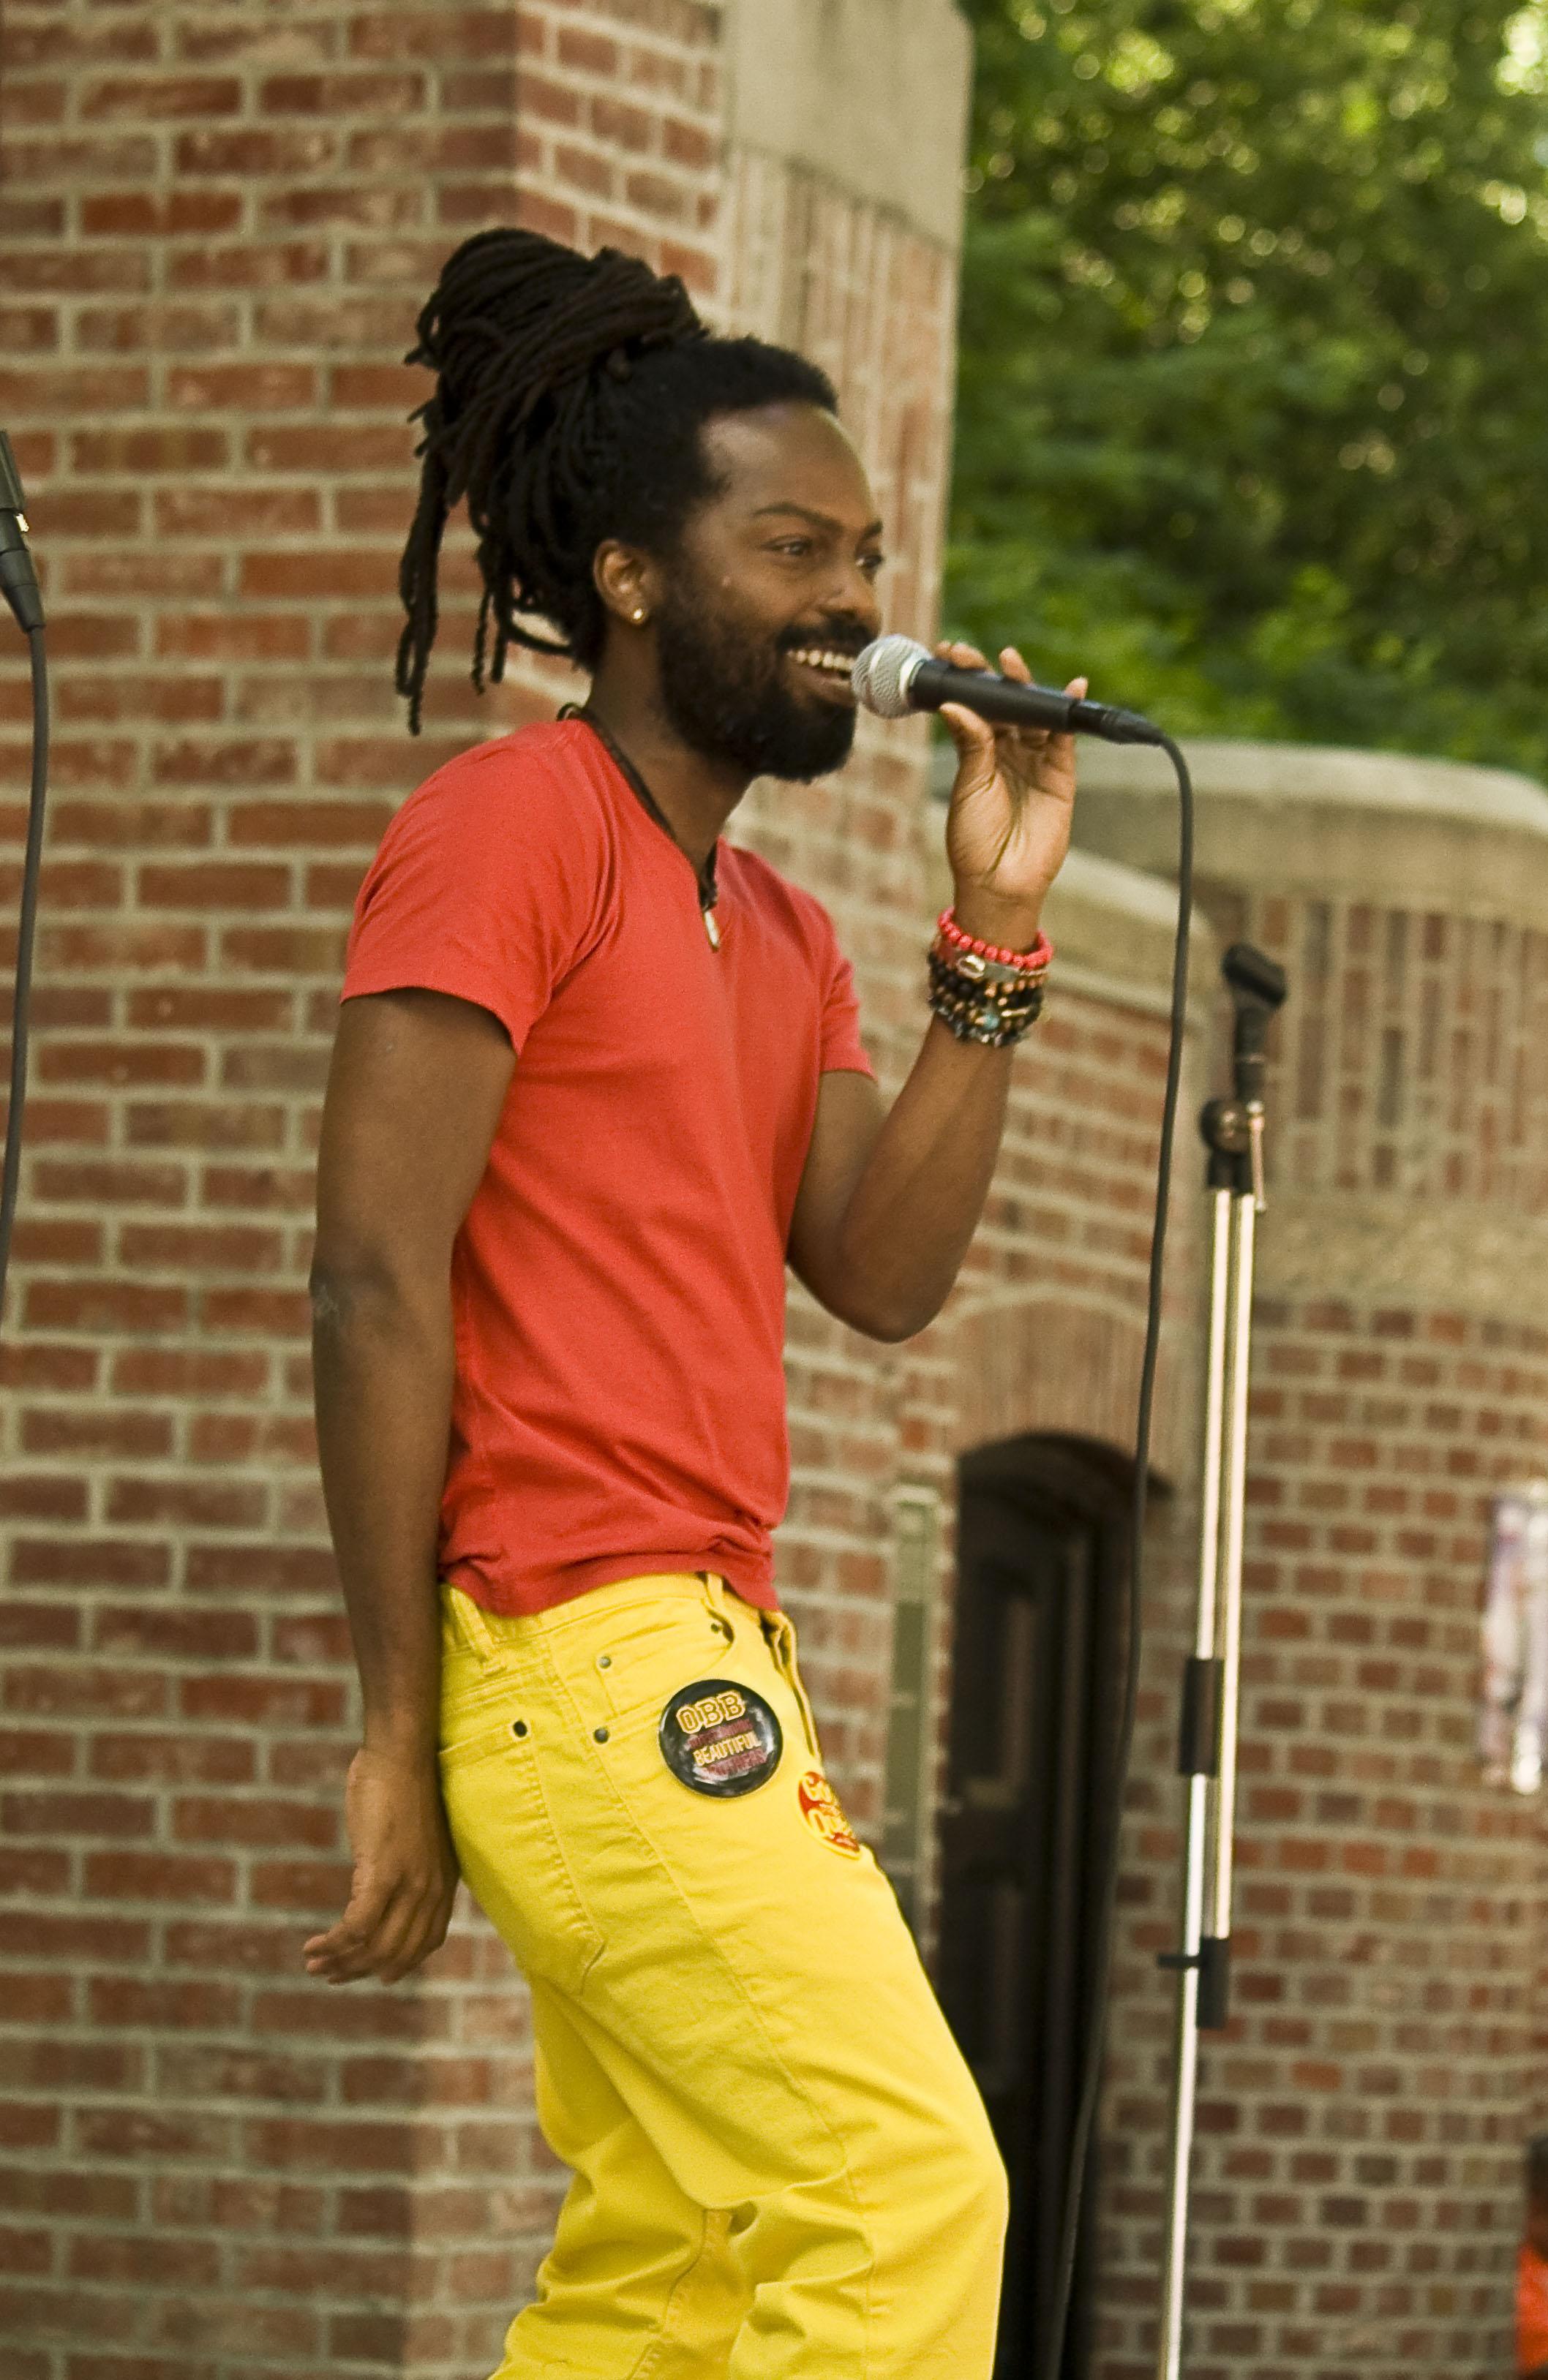 Harlem Pride 00721 Performing @ Harlem Pride 2014 shows